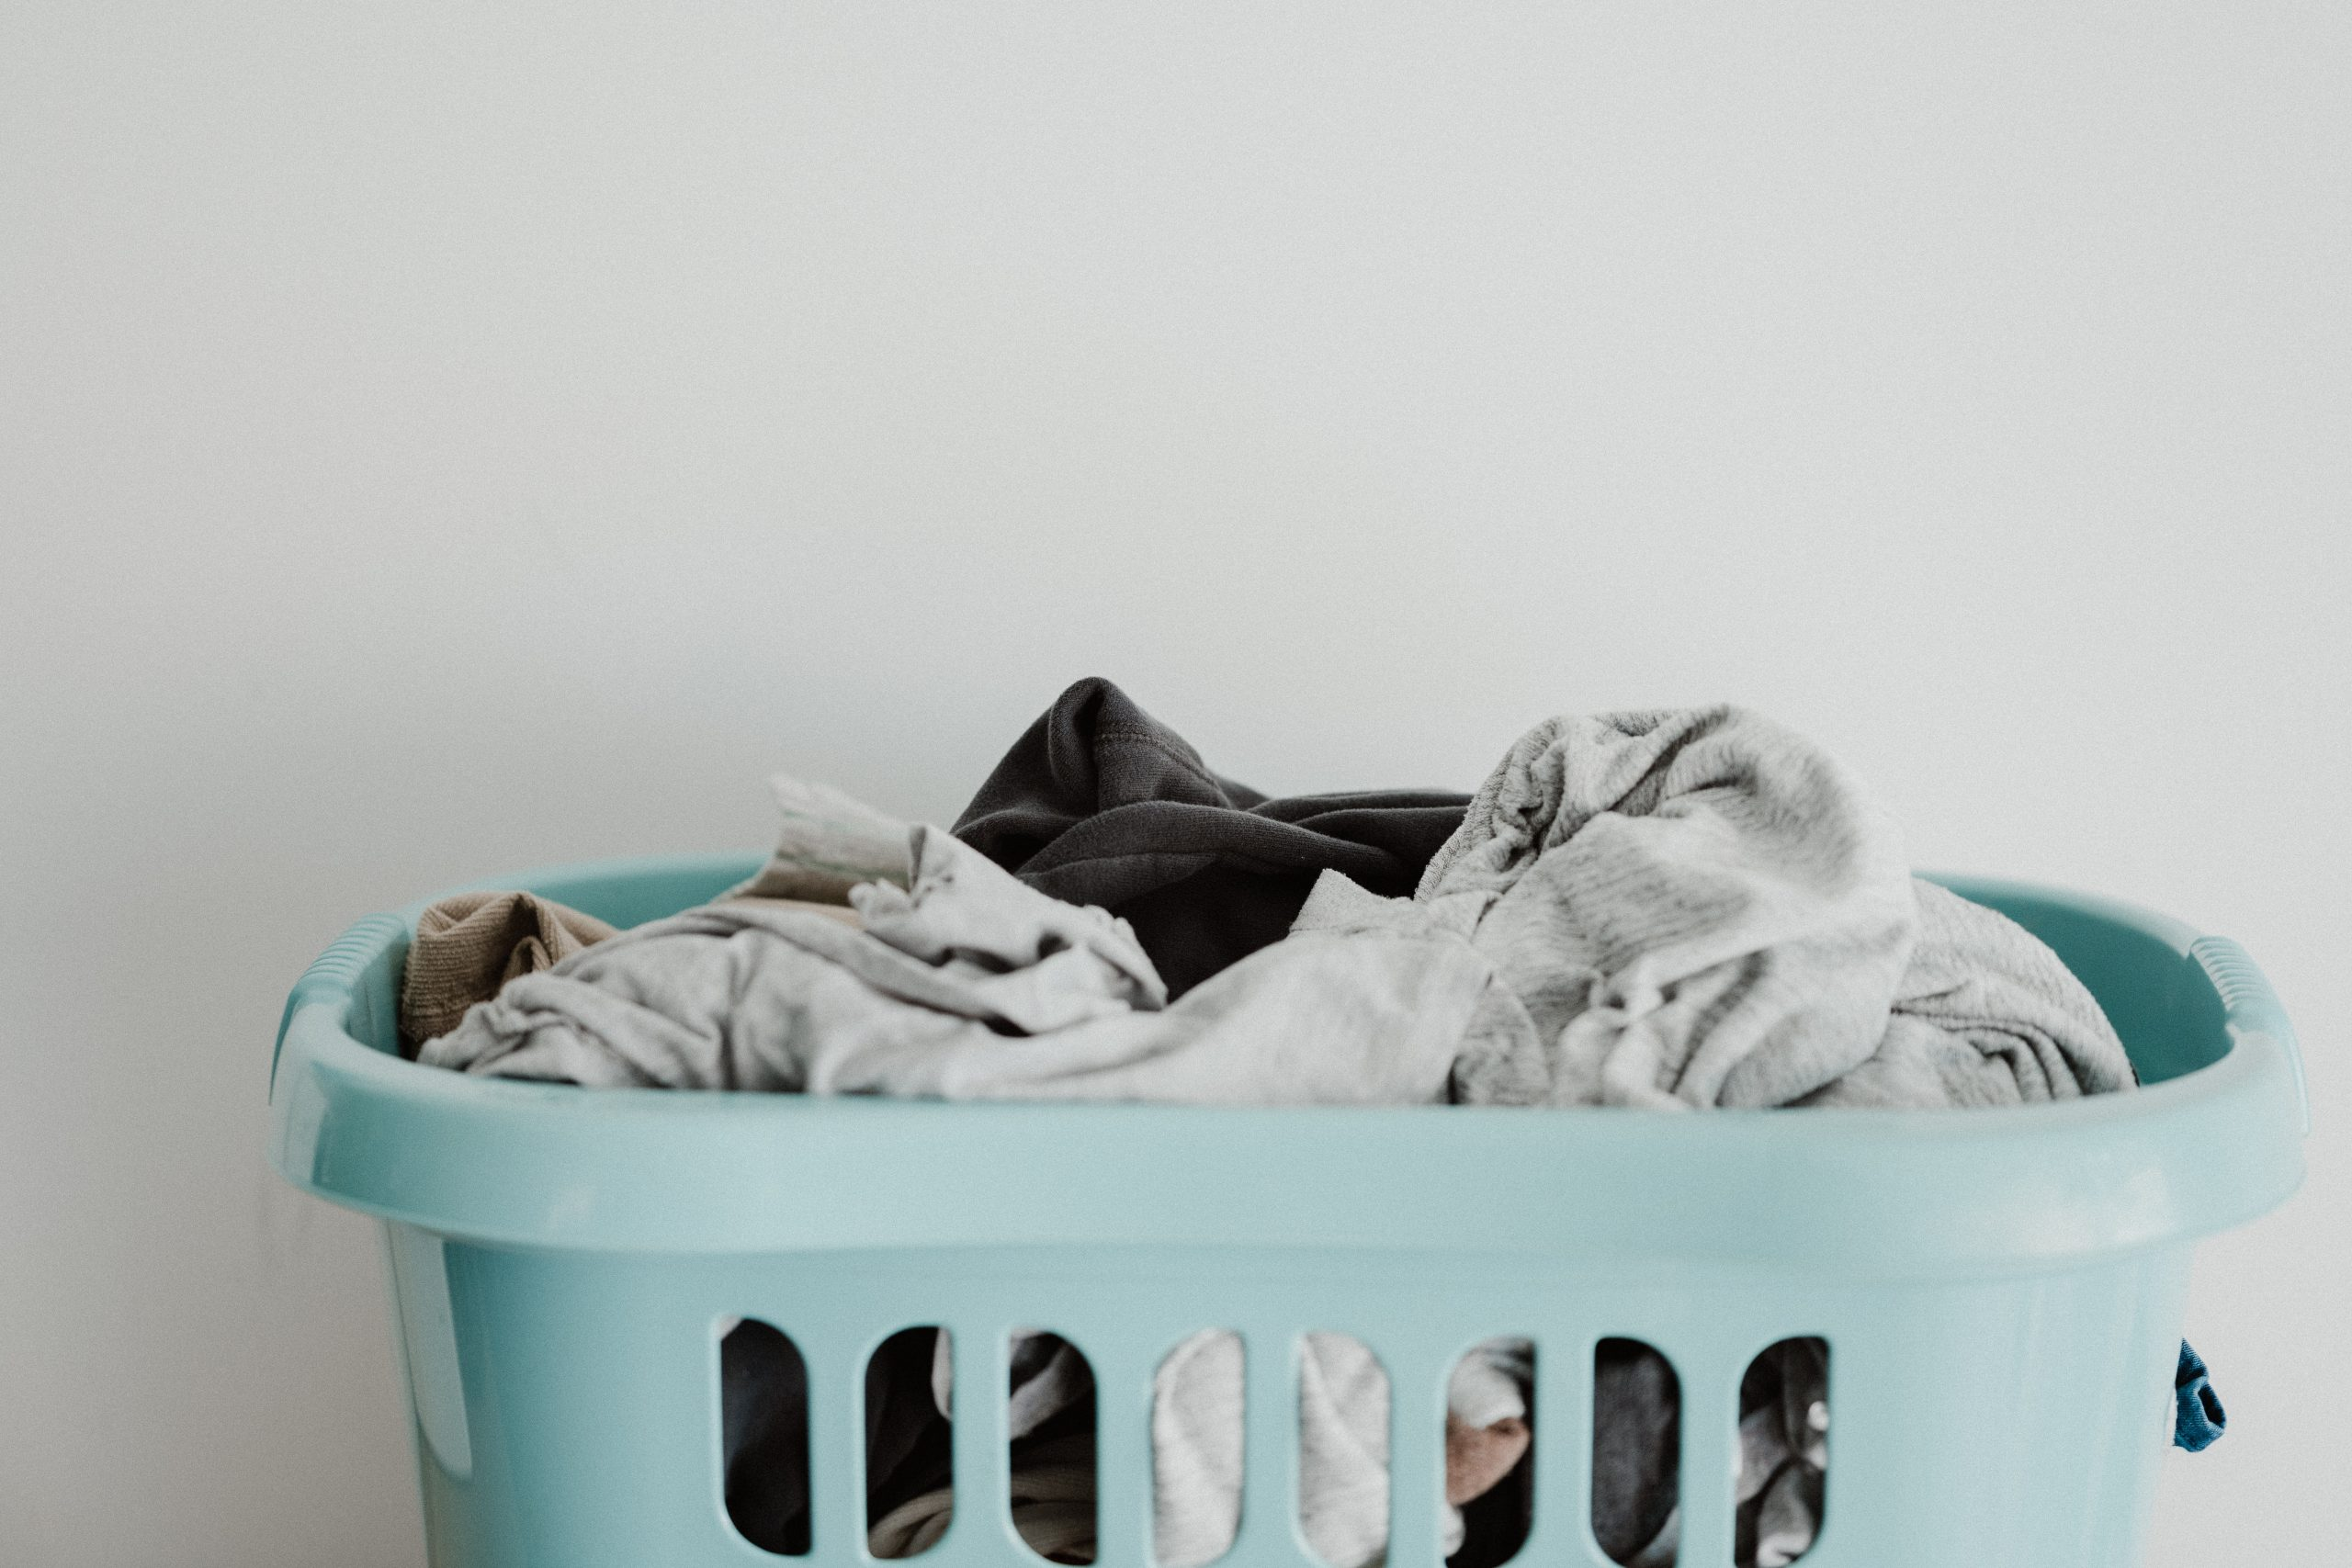 Laundry in light blue basket